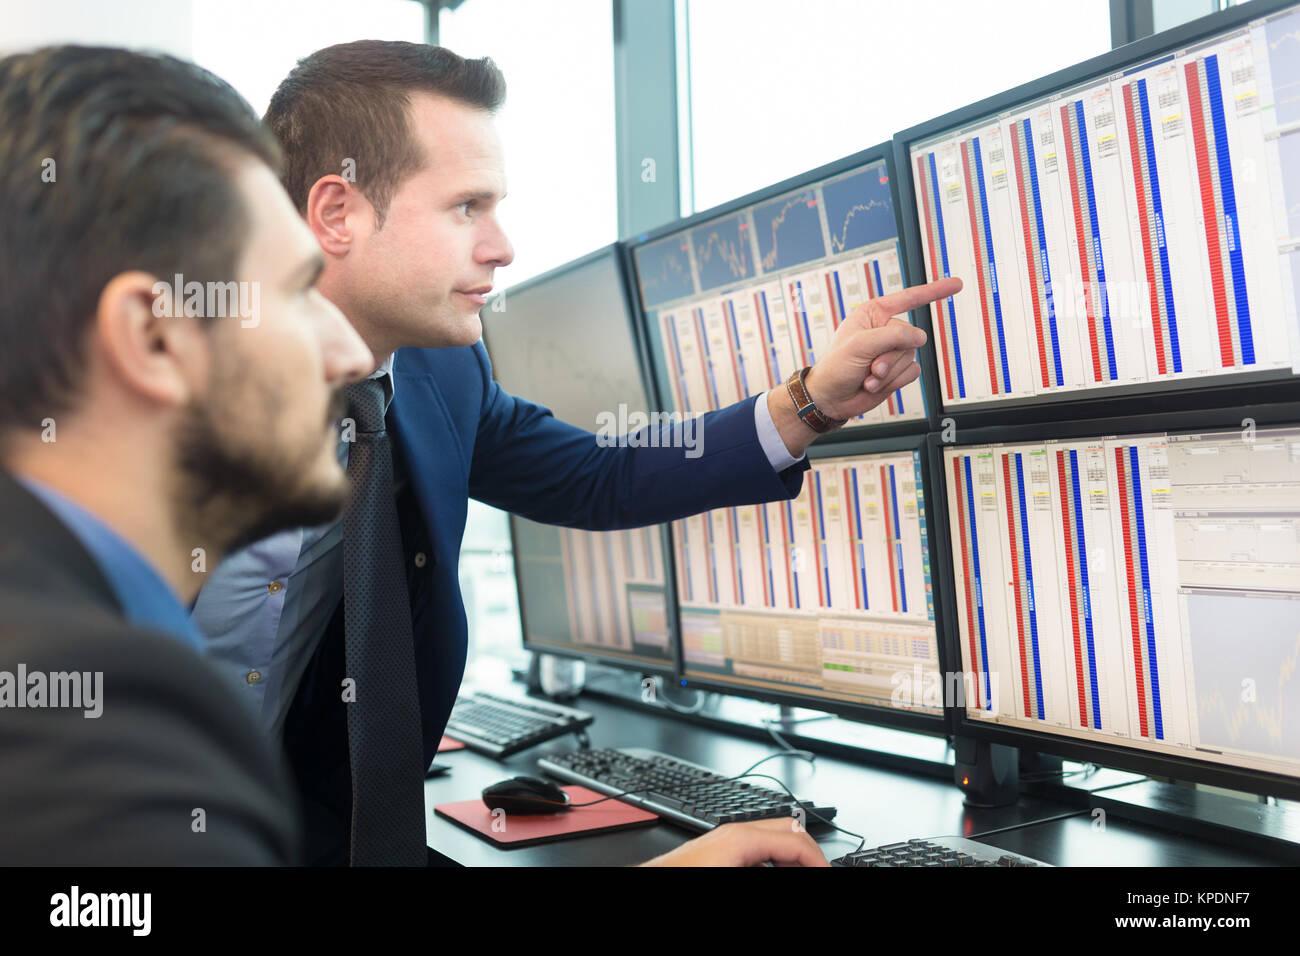 Stock traders looking at computer screens. - Stock Image